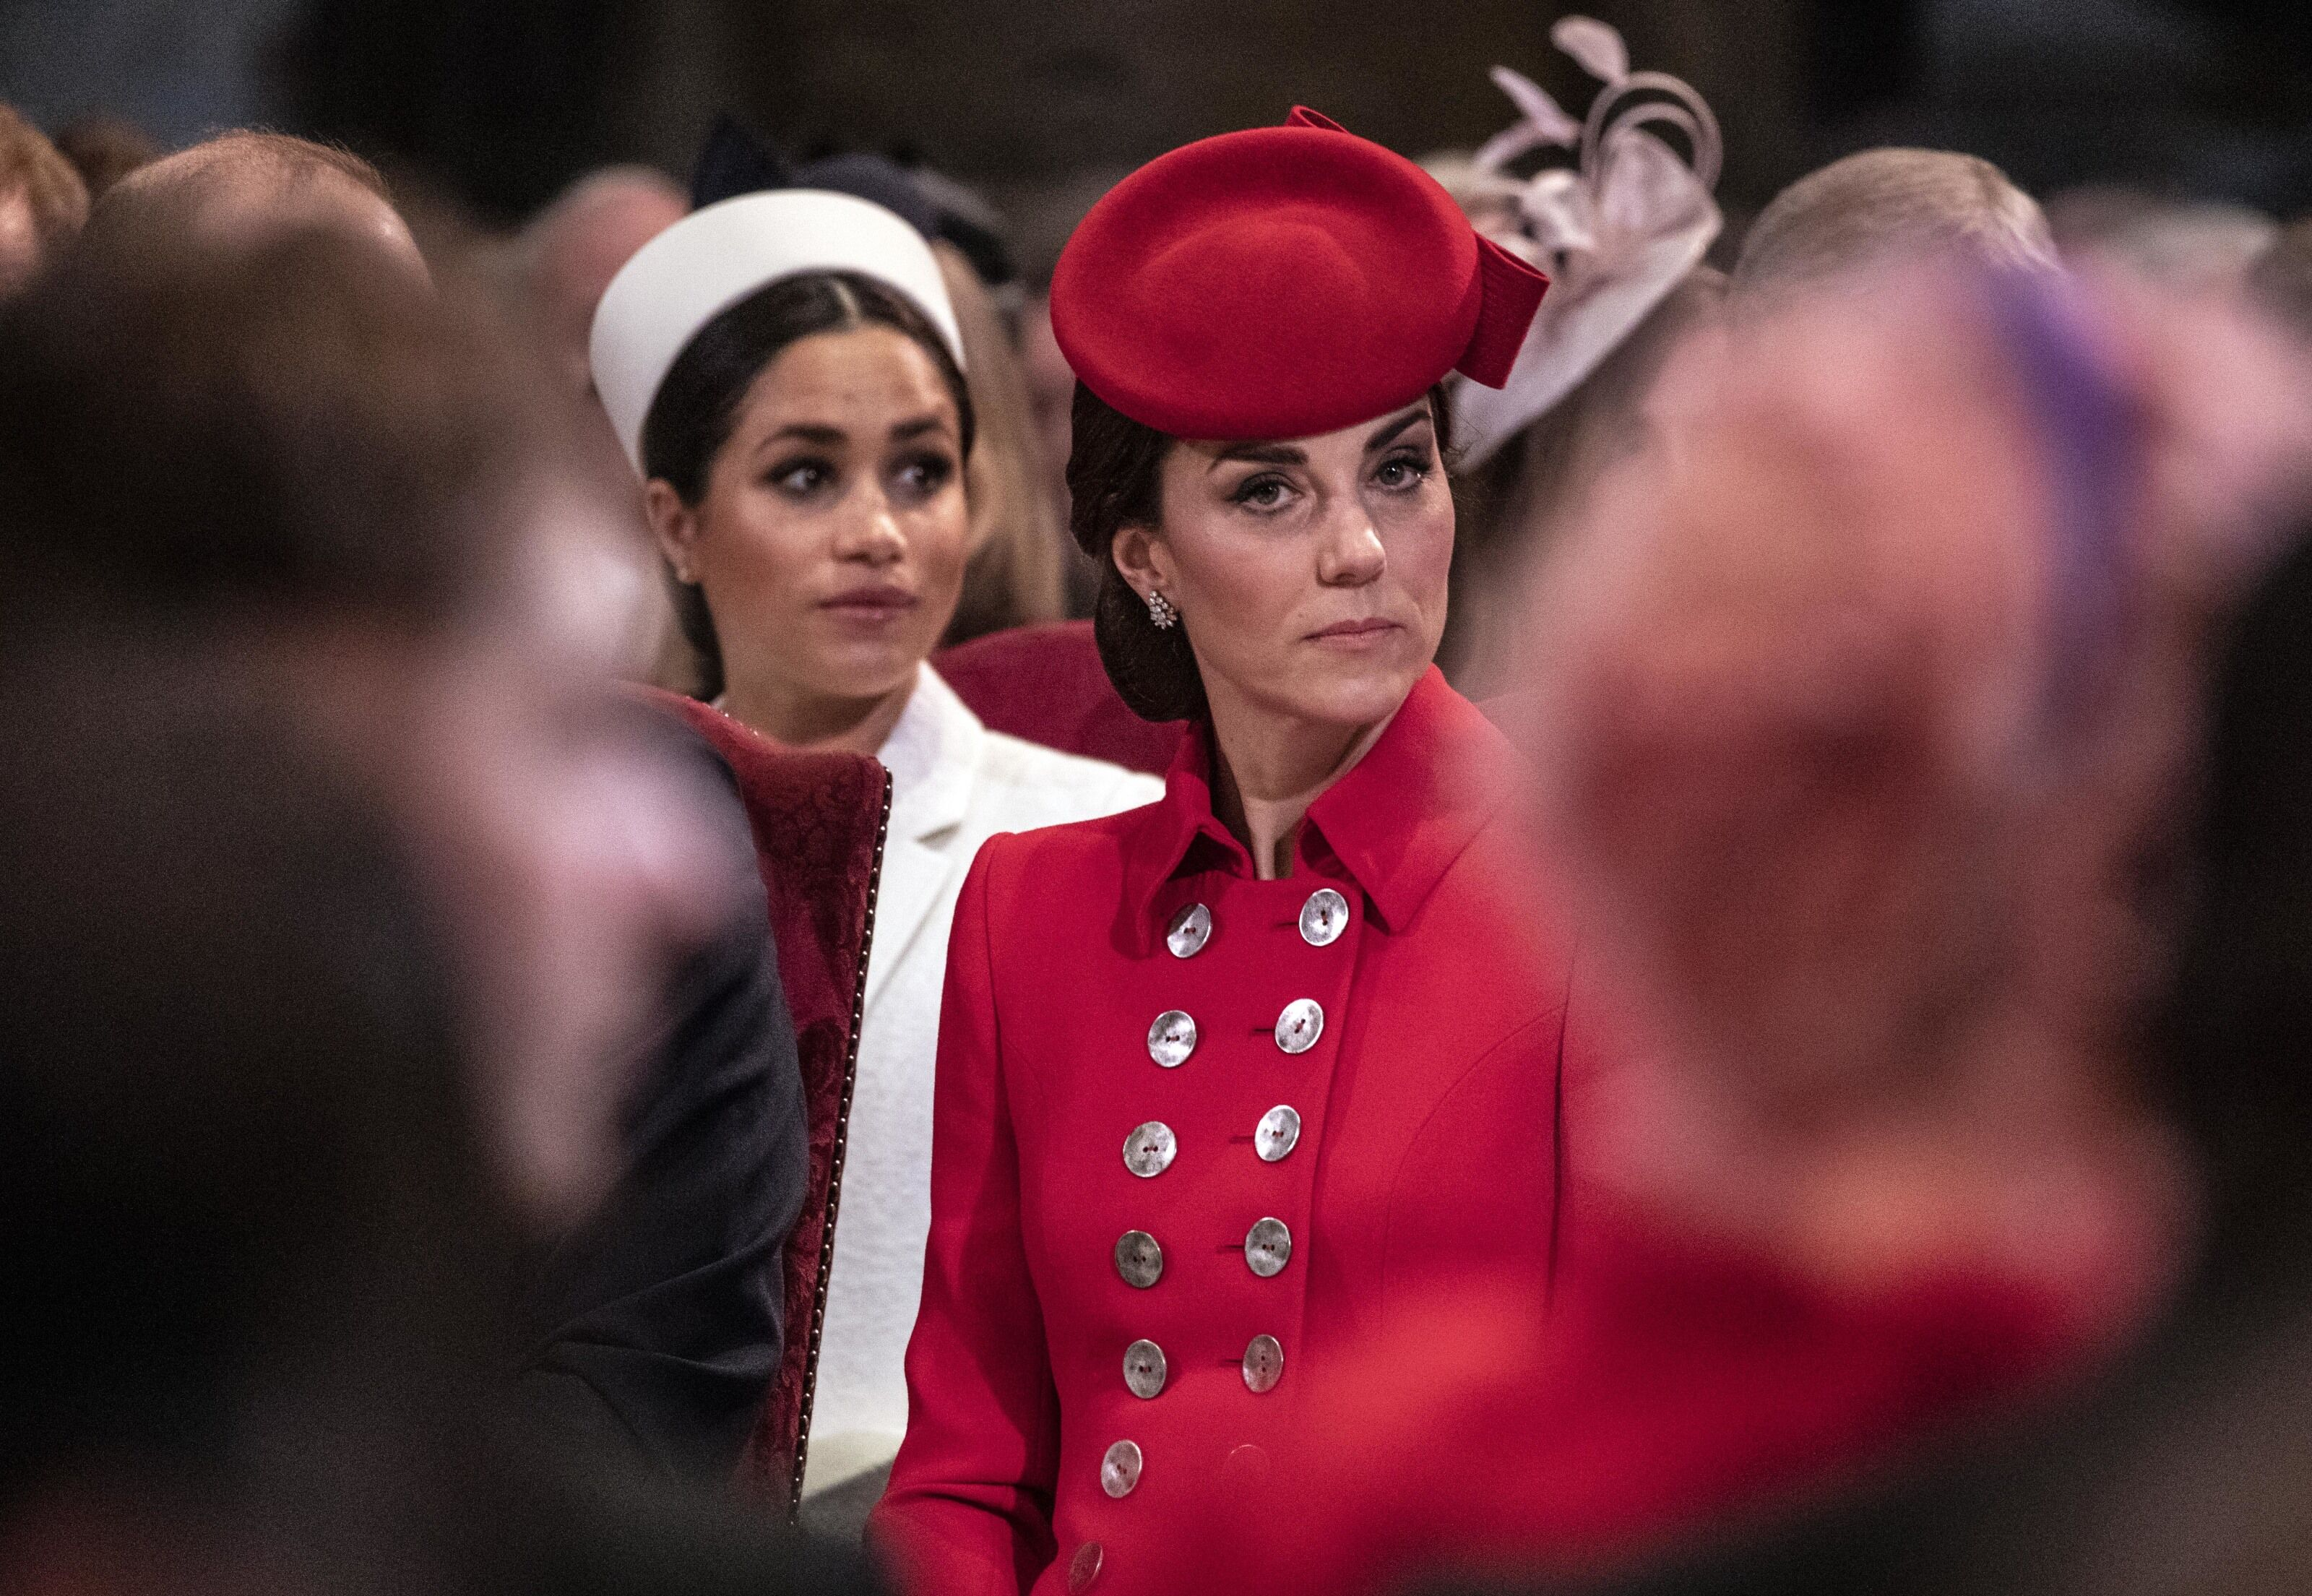 Meghan Markle second baby rumors swirl as Kate Middleton feud soars